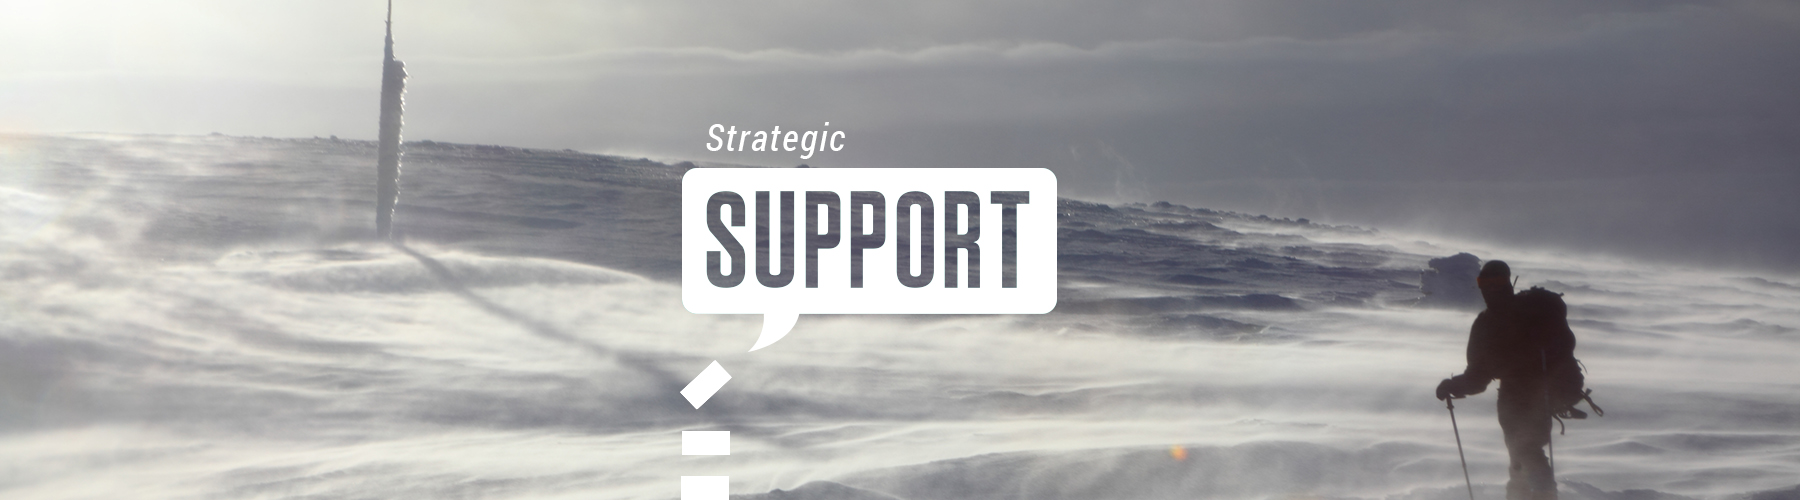 02-Strategic-Support